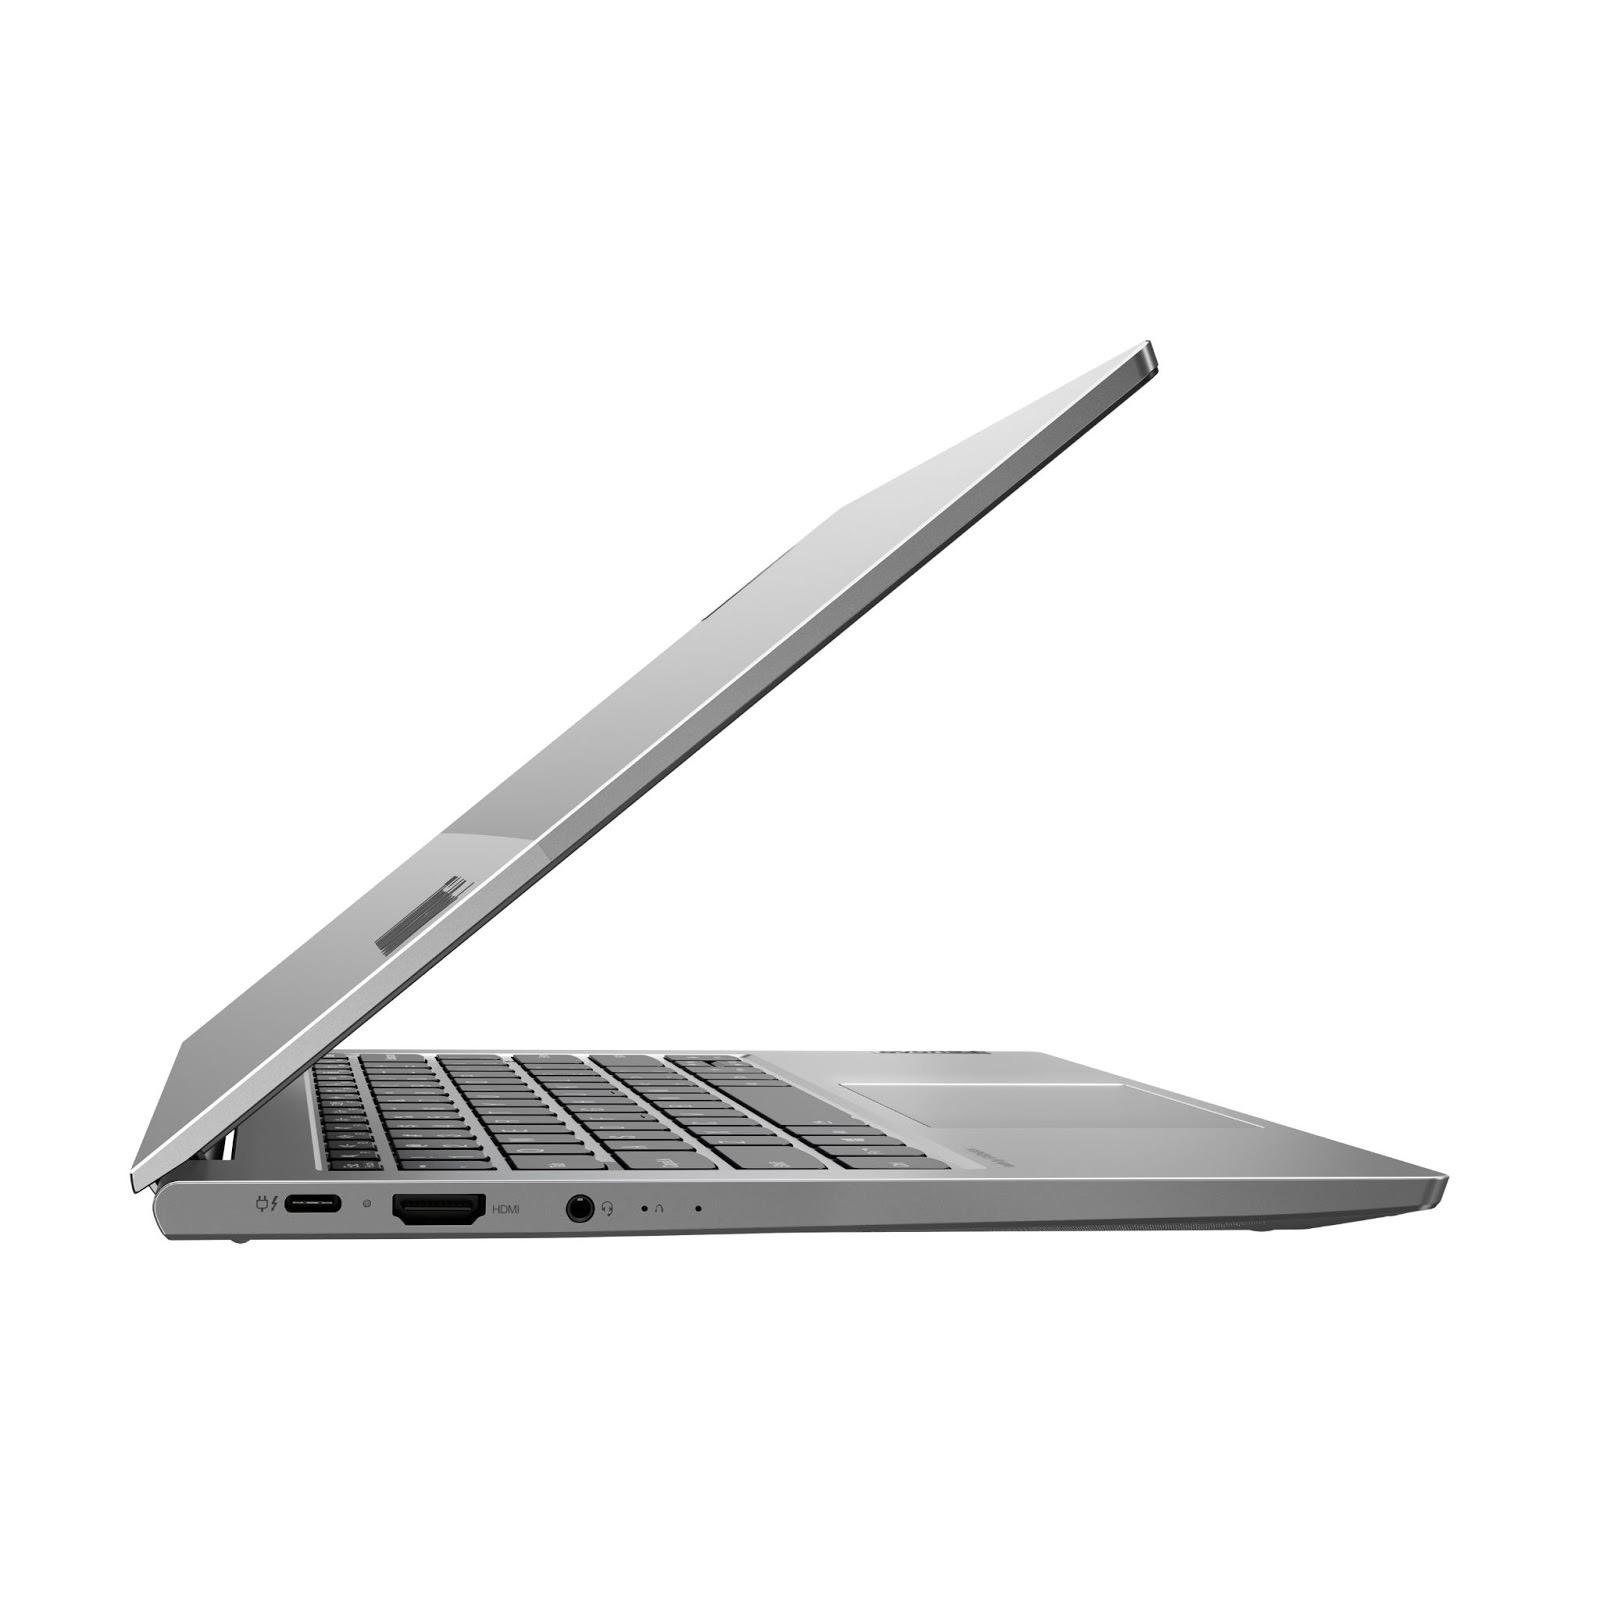 Фото 2. Ноутбук Lenovo ThinkBook 13s Gen 2 ITL (20V9003URU)